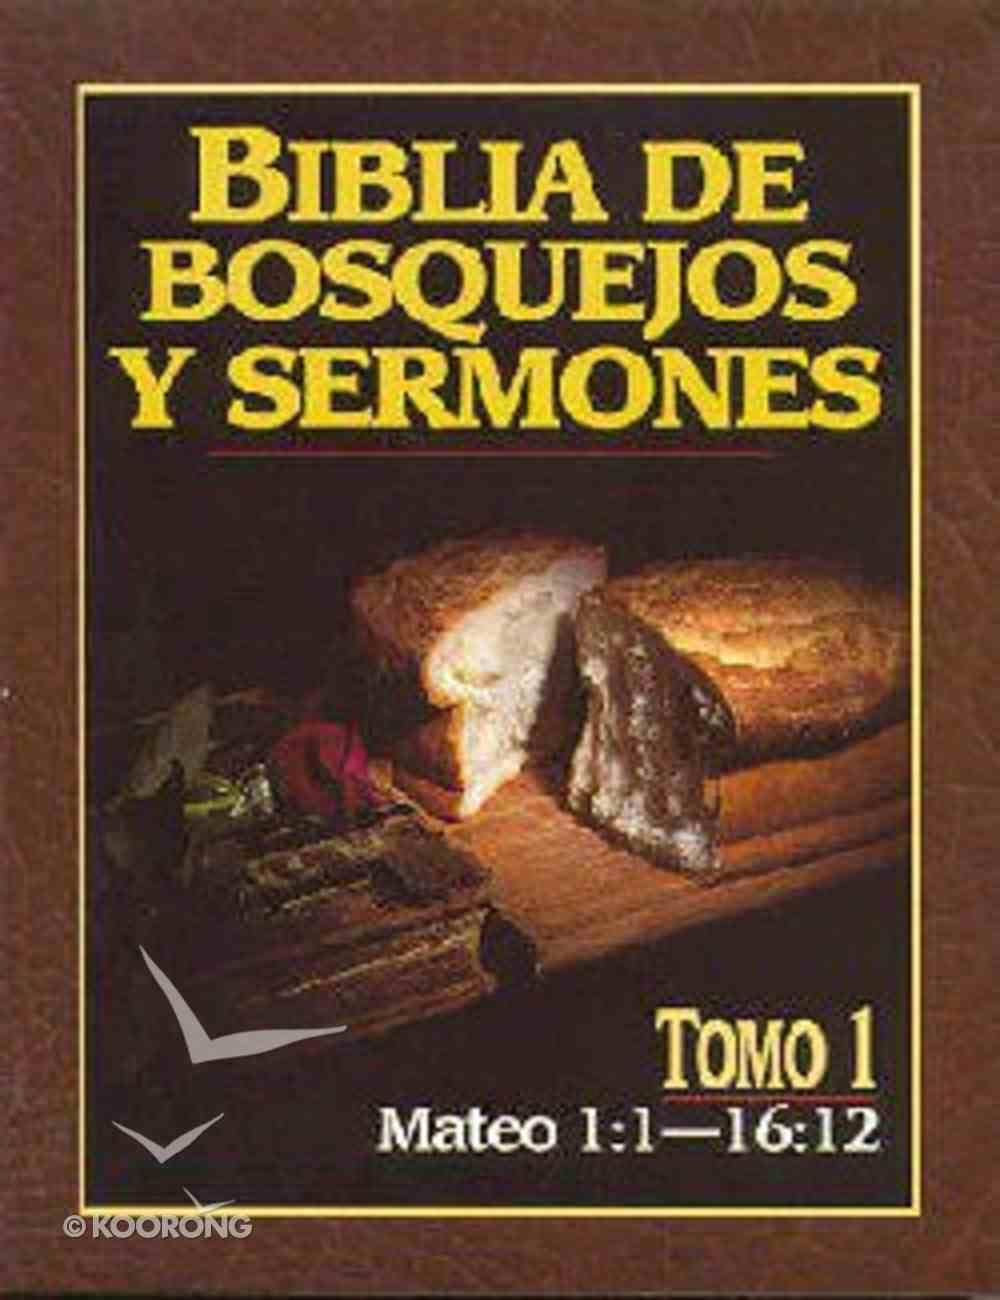 Biblia De Bosquejos Y Sermones #01: Mateo 1:1-16:12 (Posb #01: Matthew 1:1-16:12) (#01 in Preacher's Outline & Sermon Bible Series) Paperback